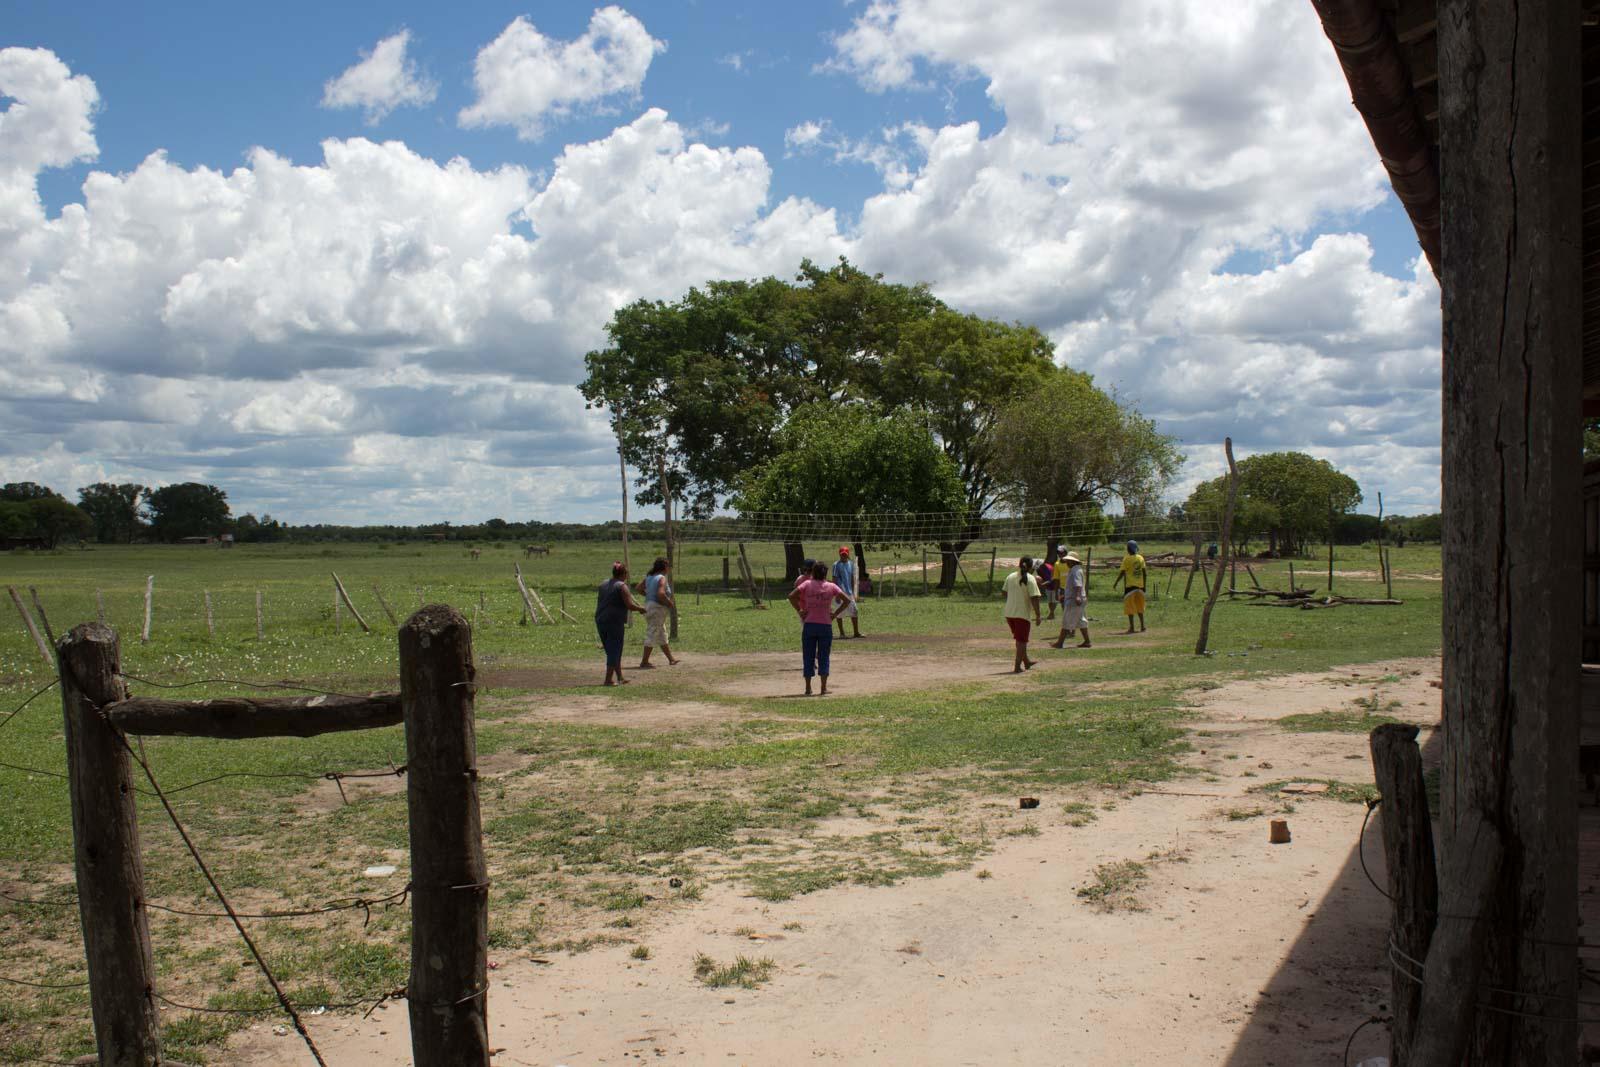 paraguay indigenous native tribes survival international near concepcion